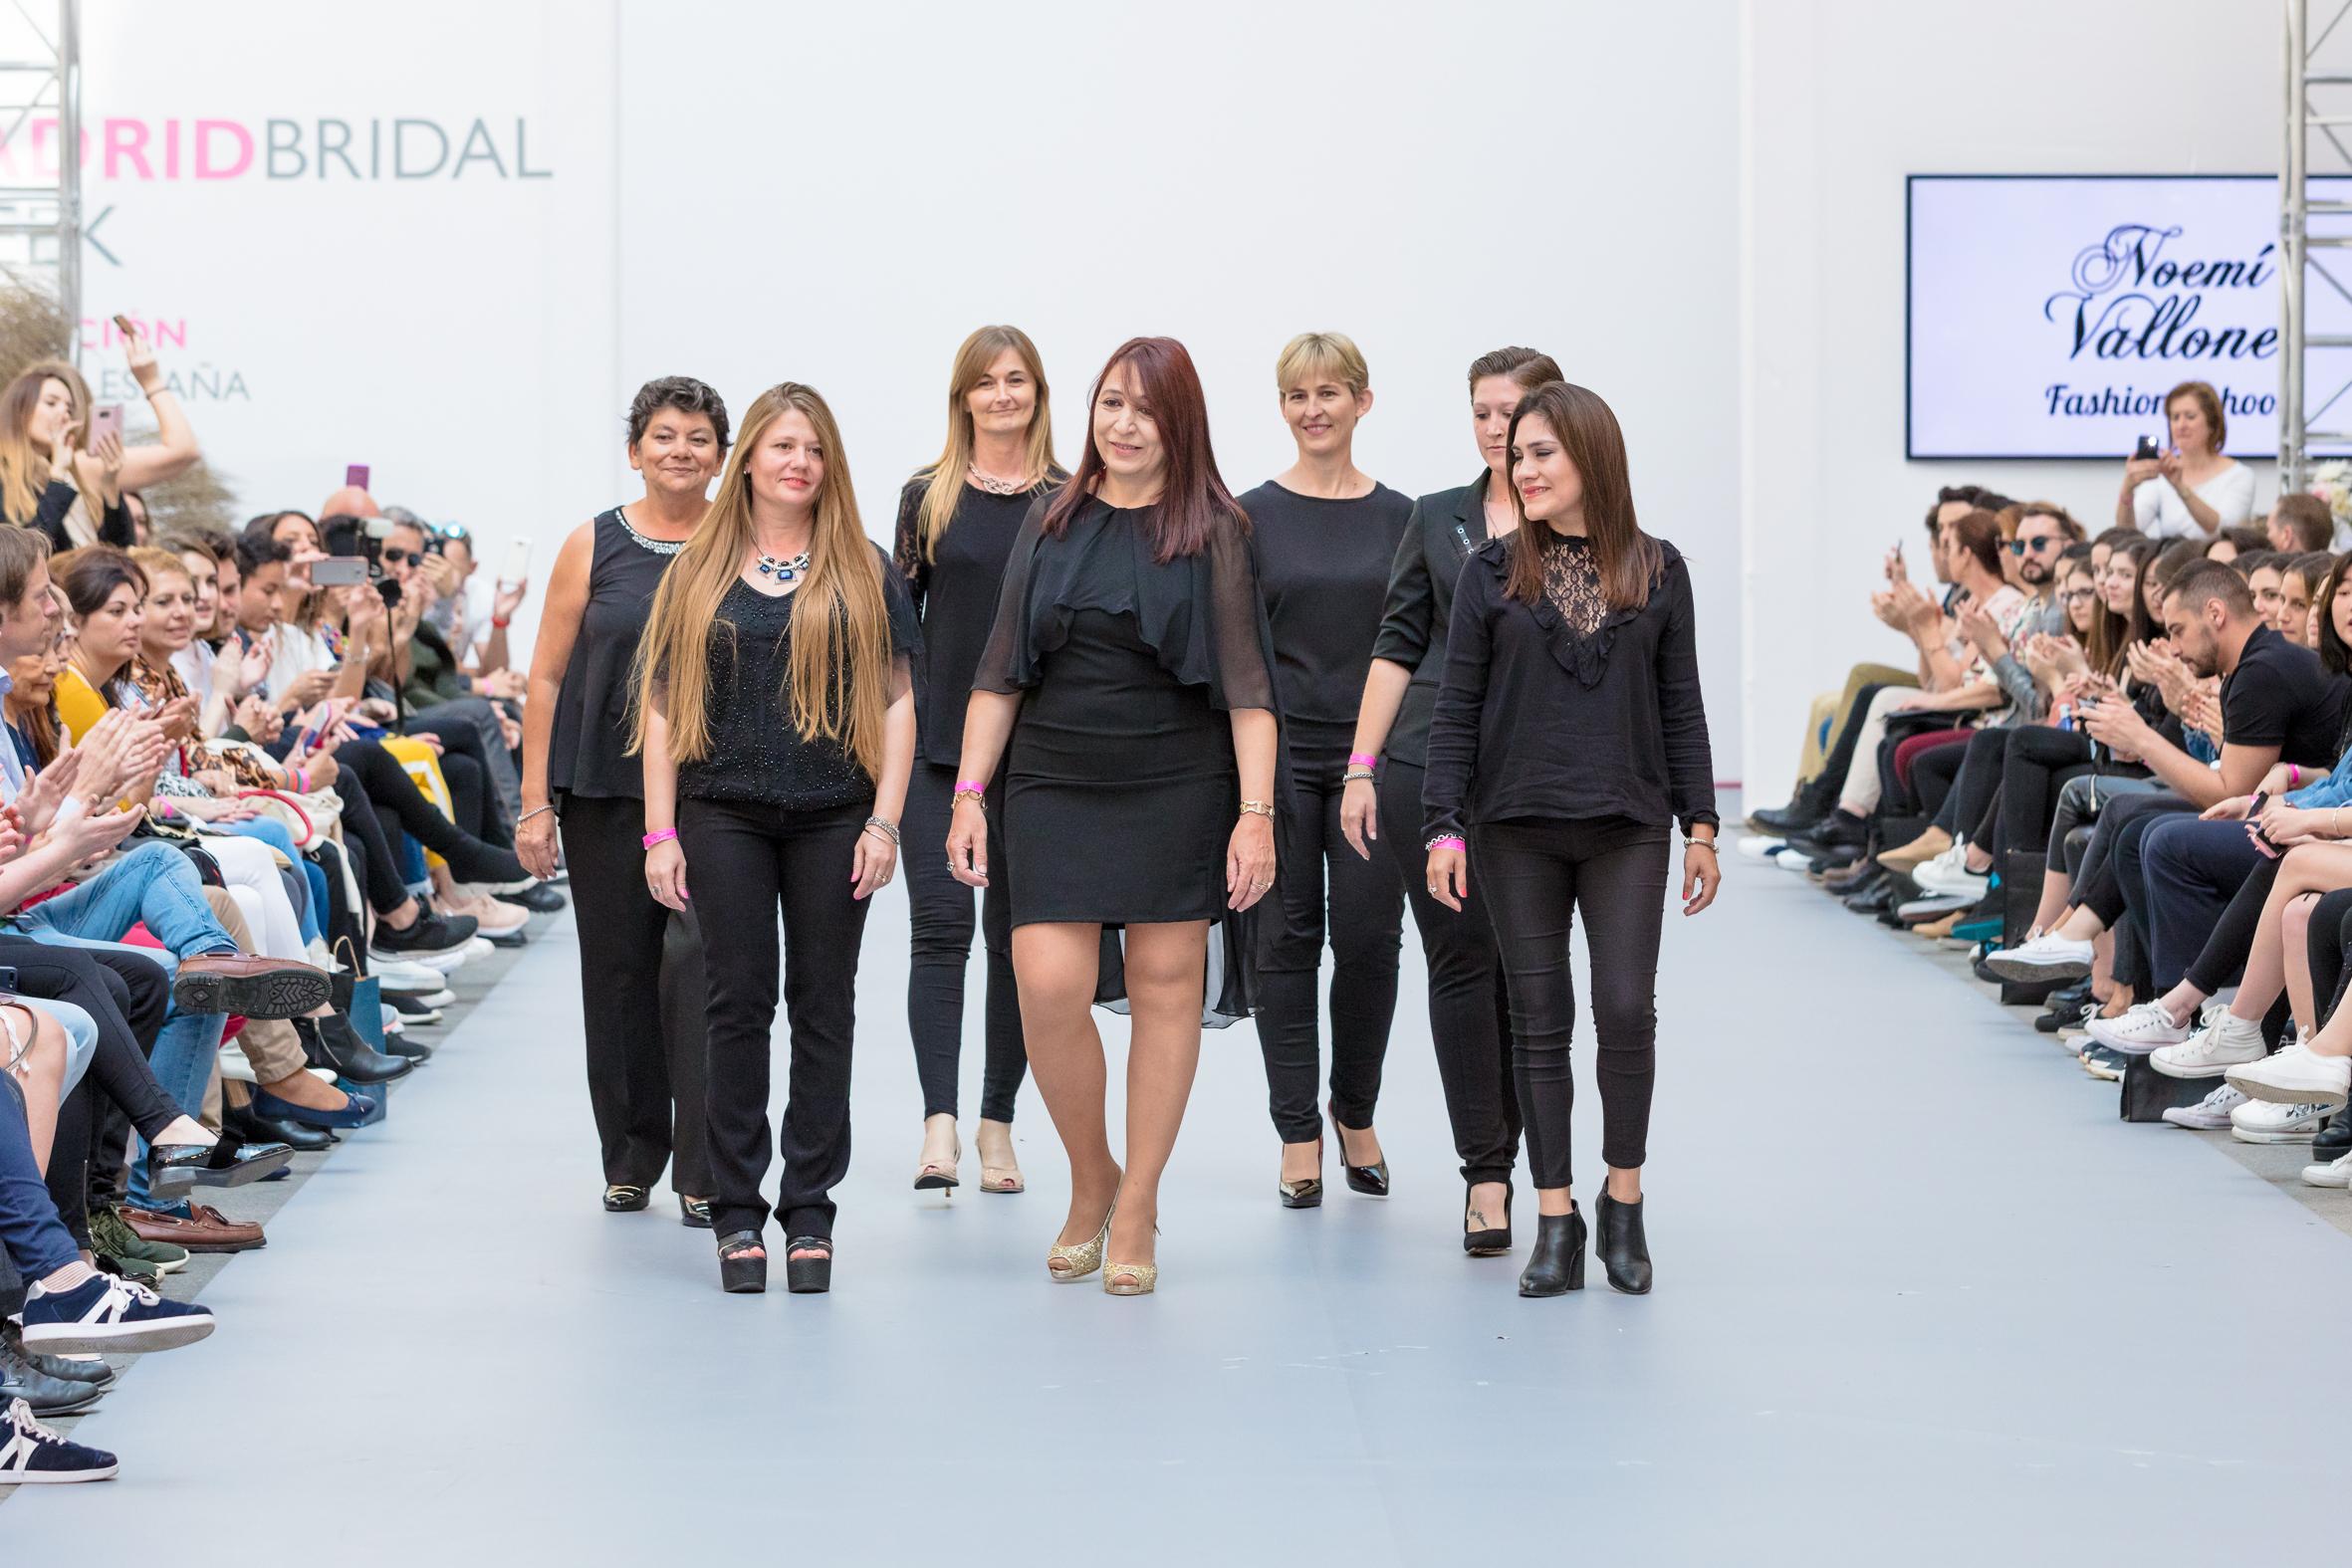 Noemí Vallone Fashion School